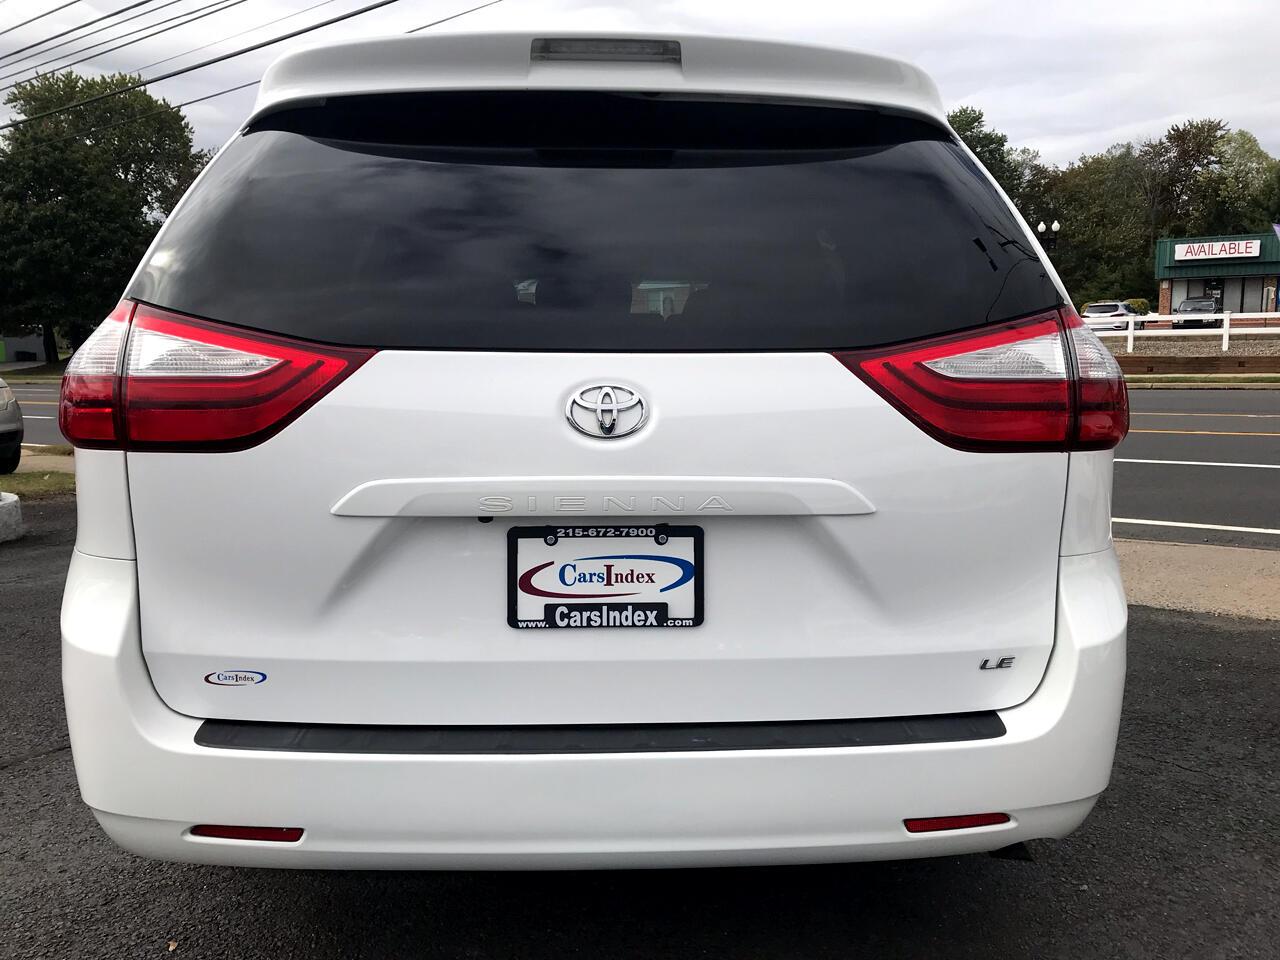 2017 Toyota Sienna LE FWD 8-Passenger (Natl)